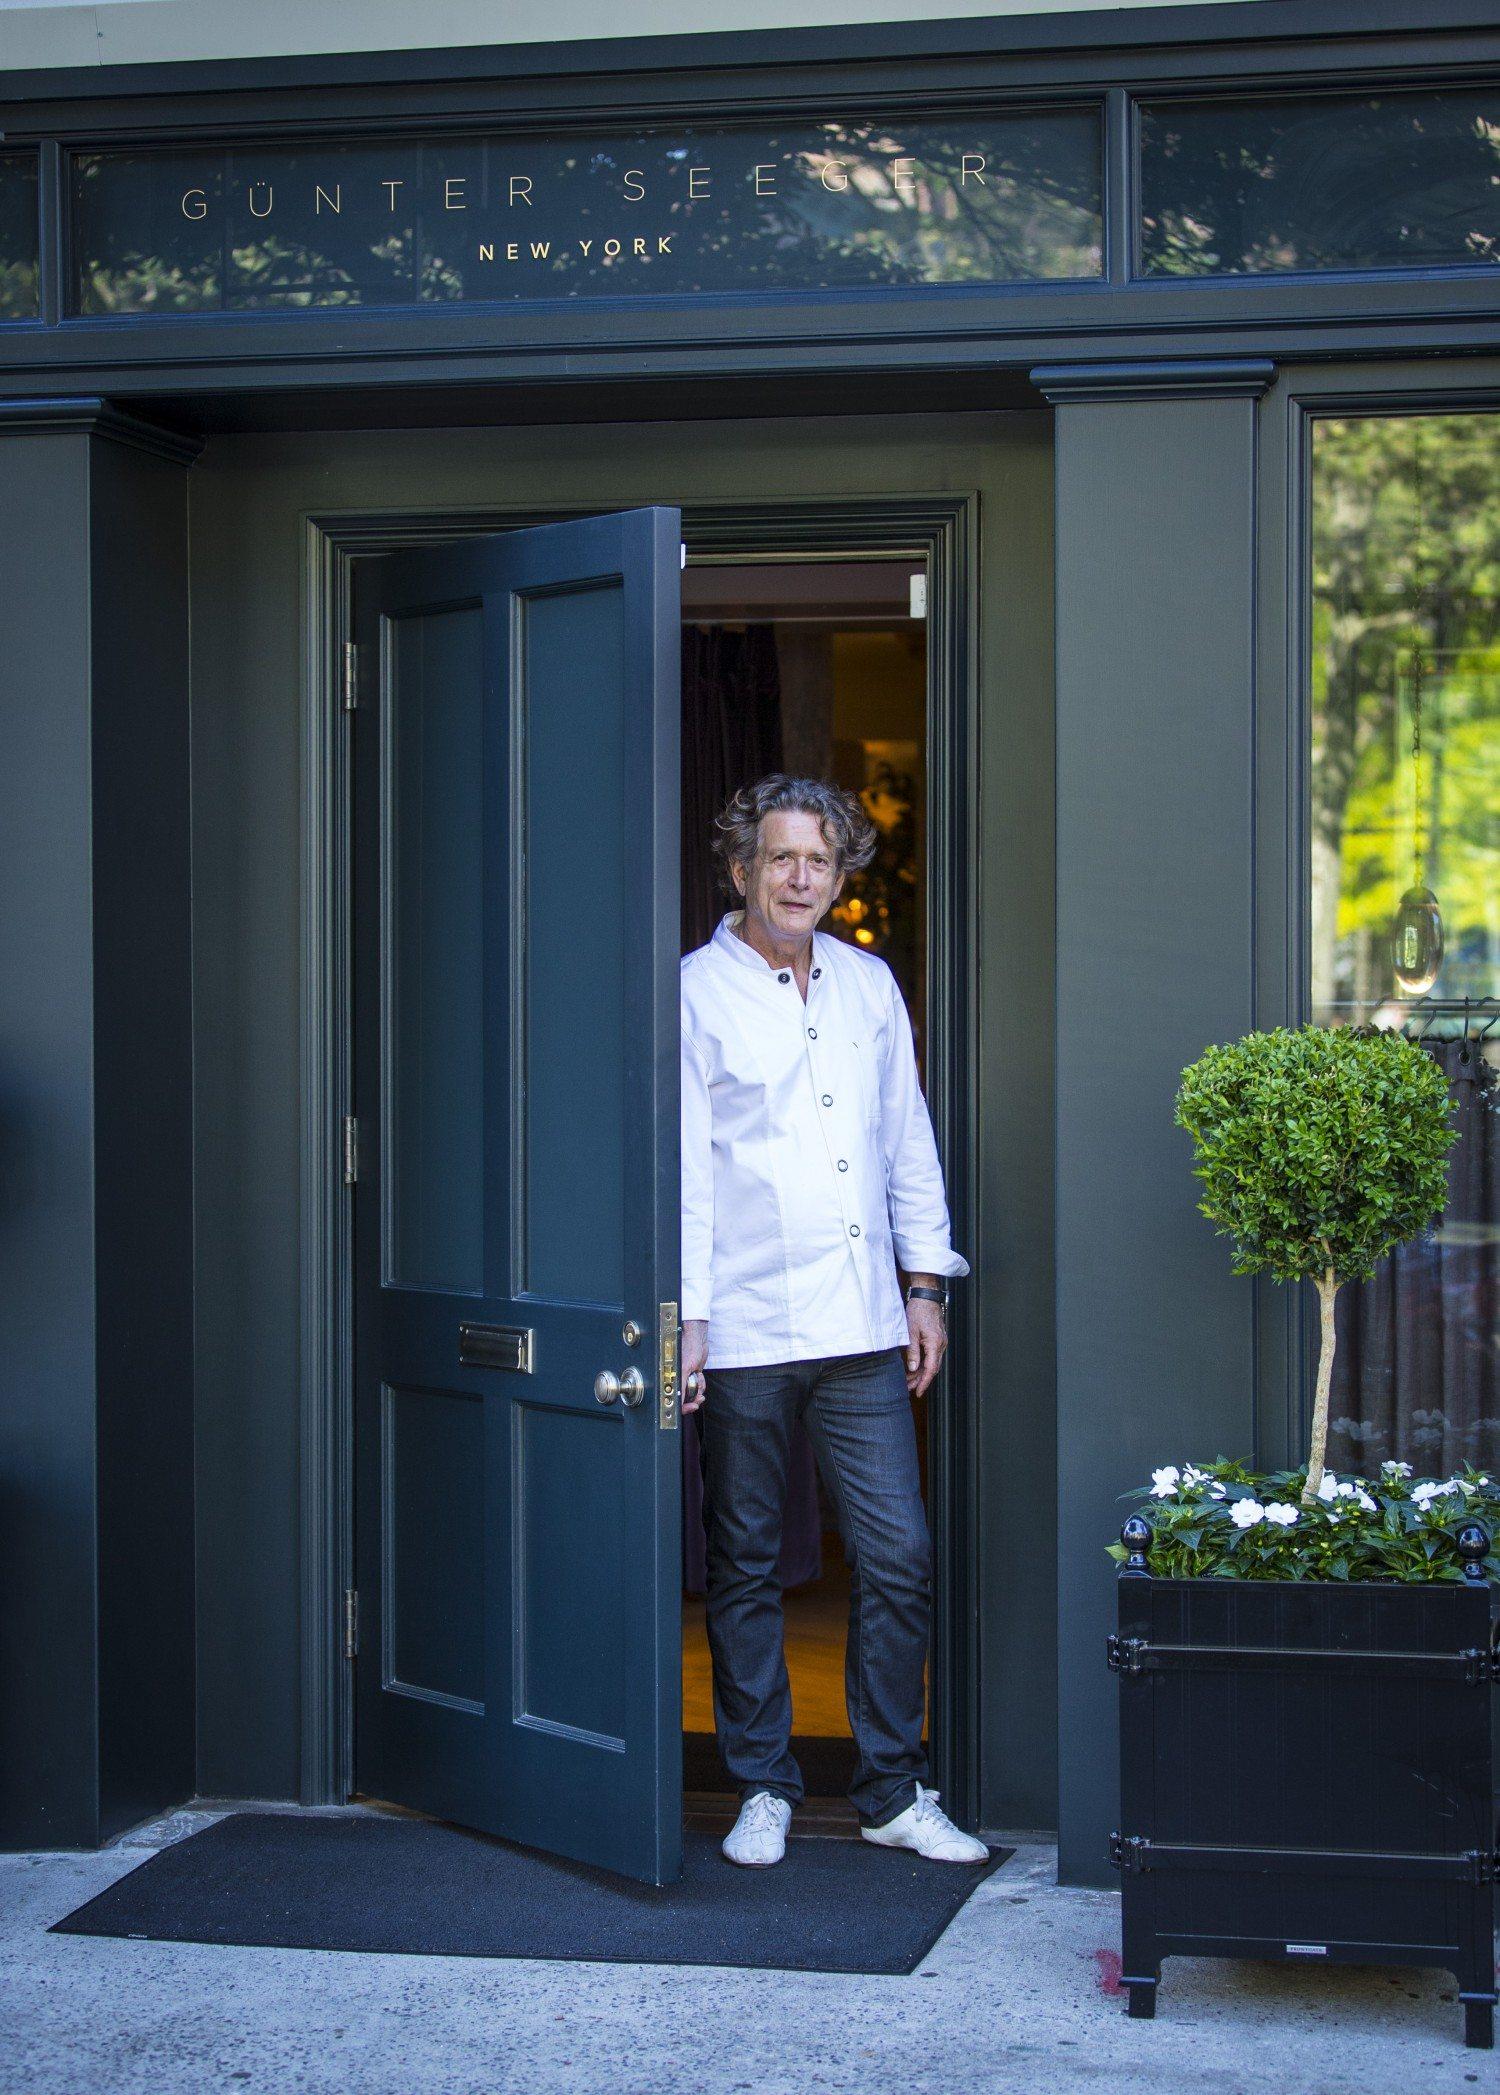 Chef Günter Seeger - Photo by Brian Bloom